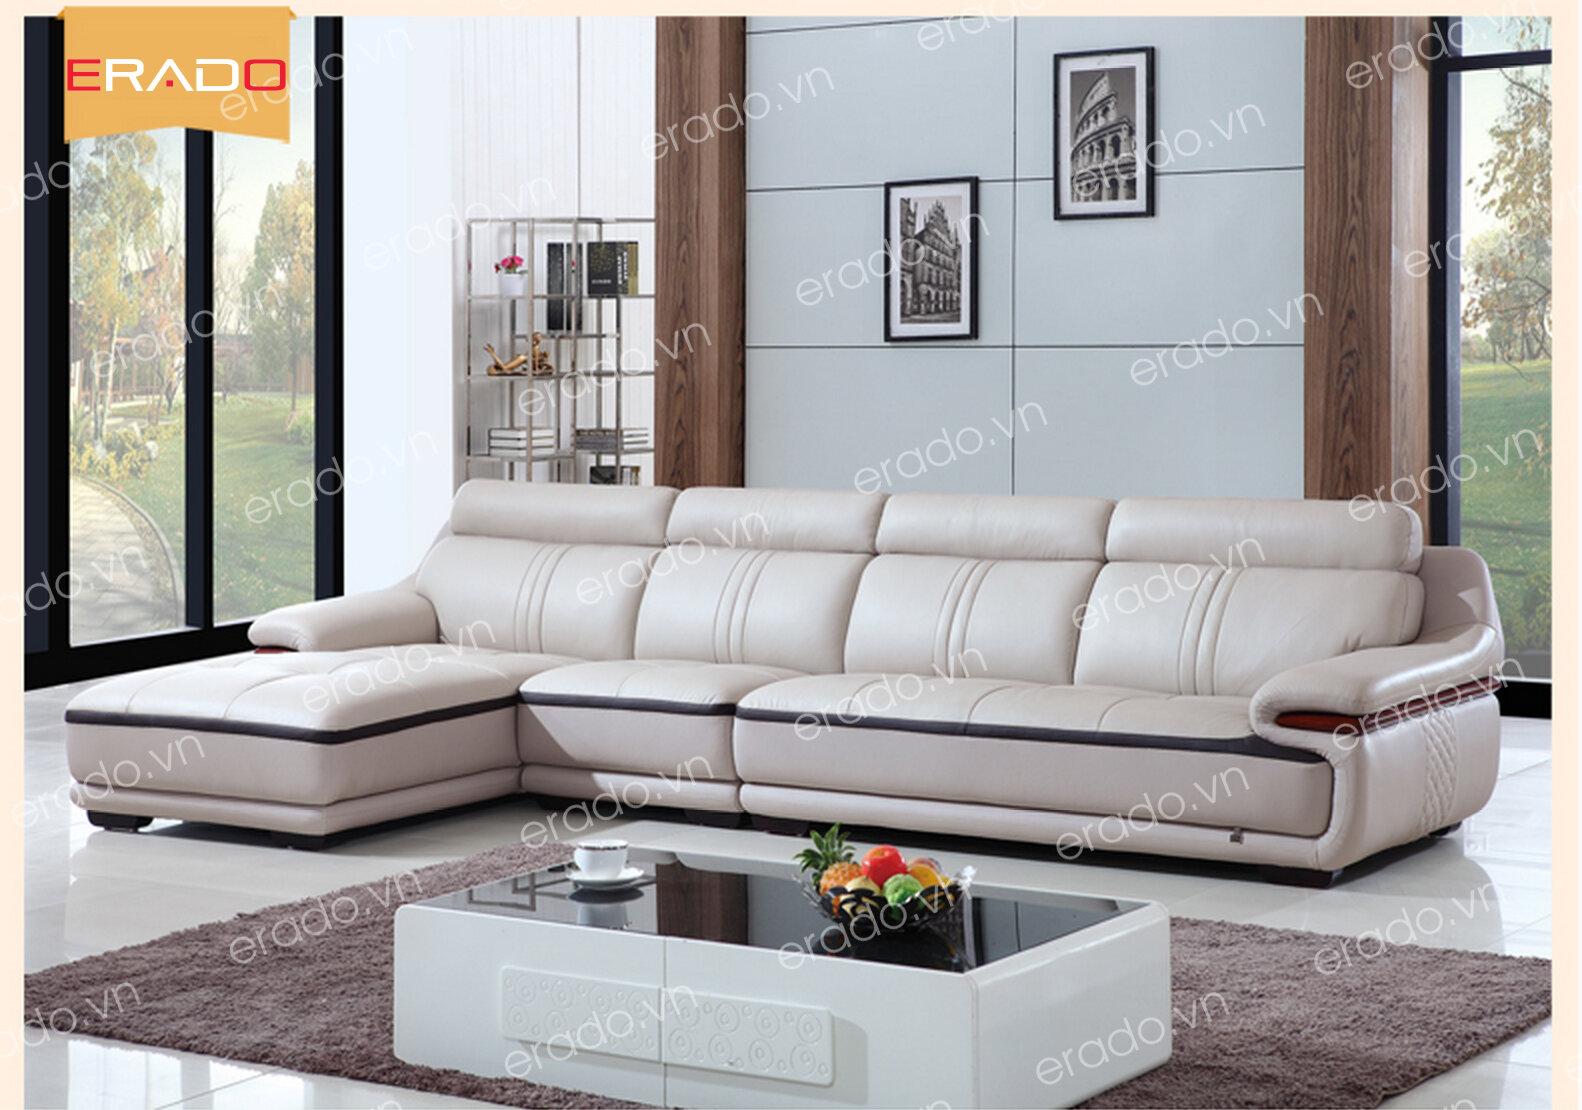 Sofa da mã 373